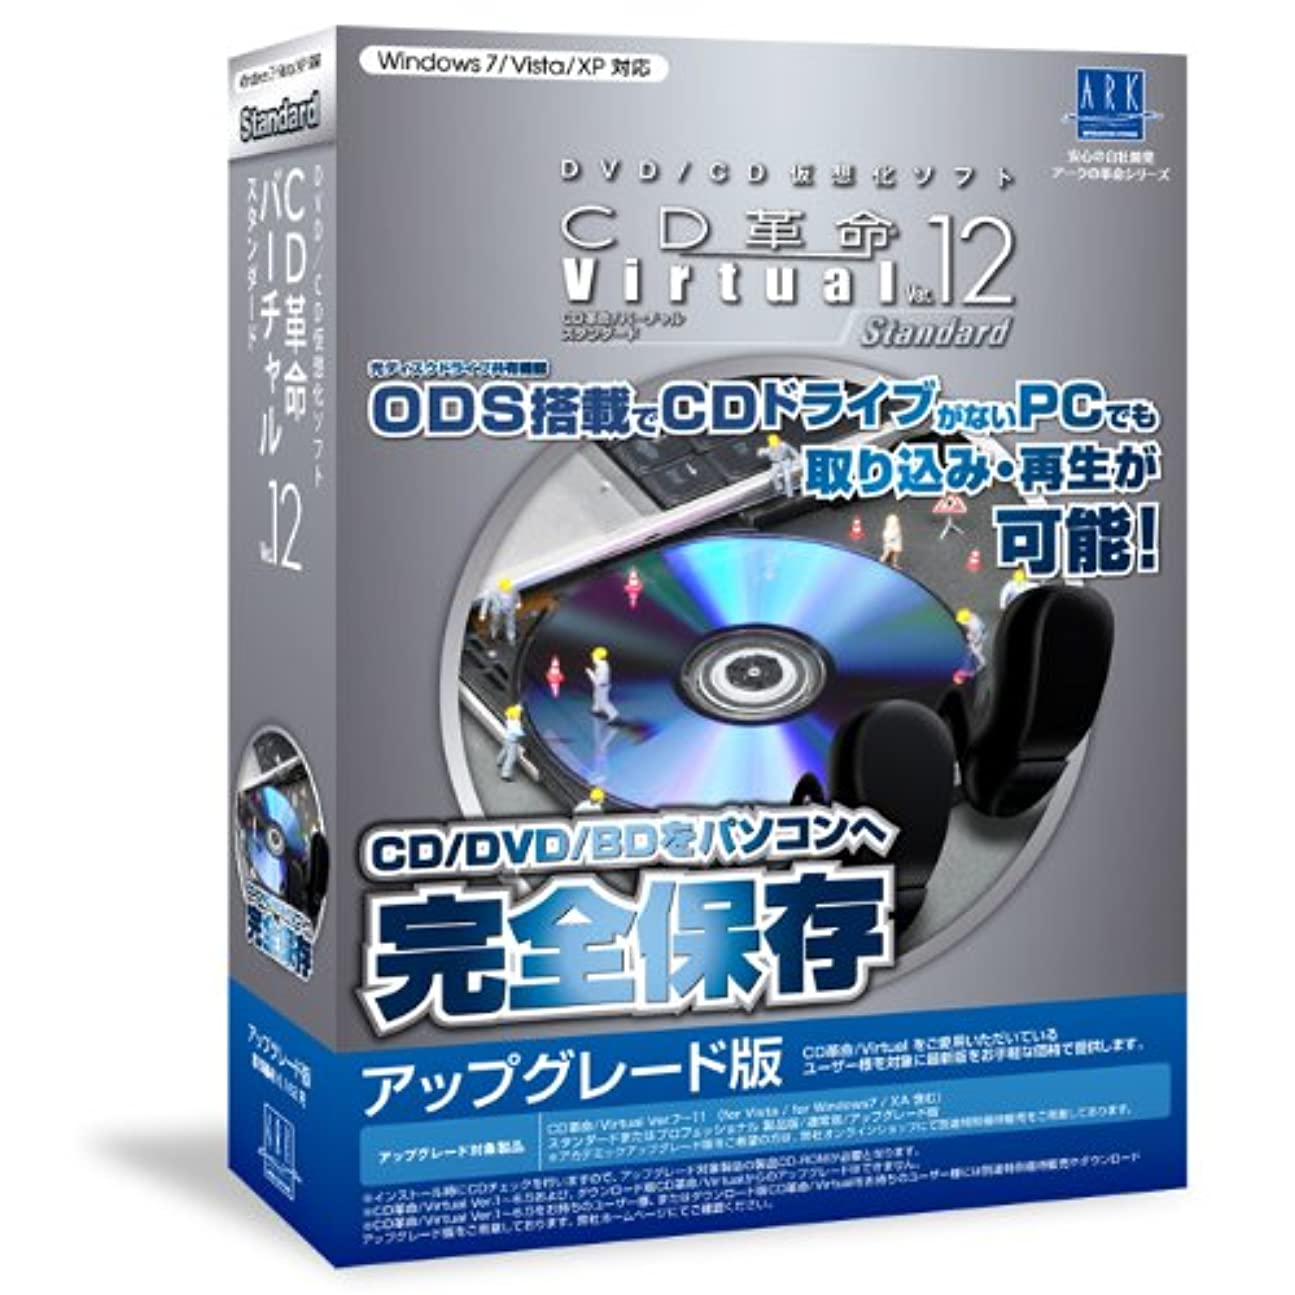 CD革命/Virtual Ver.12 Standard アップグレード版